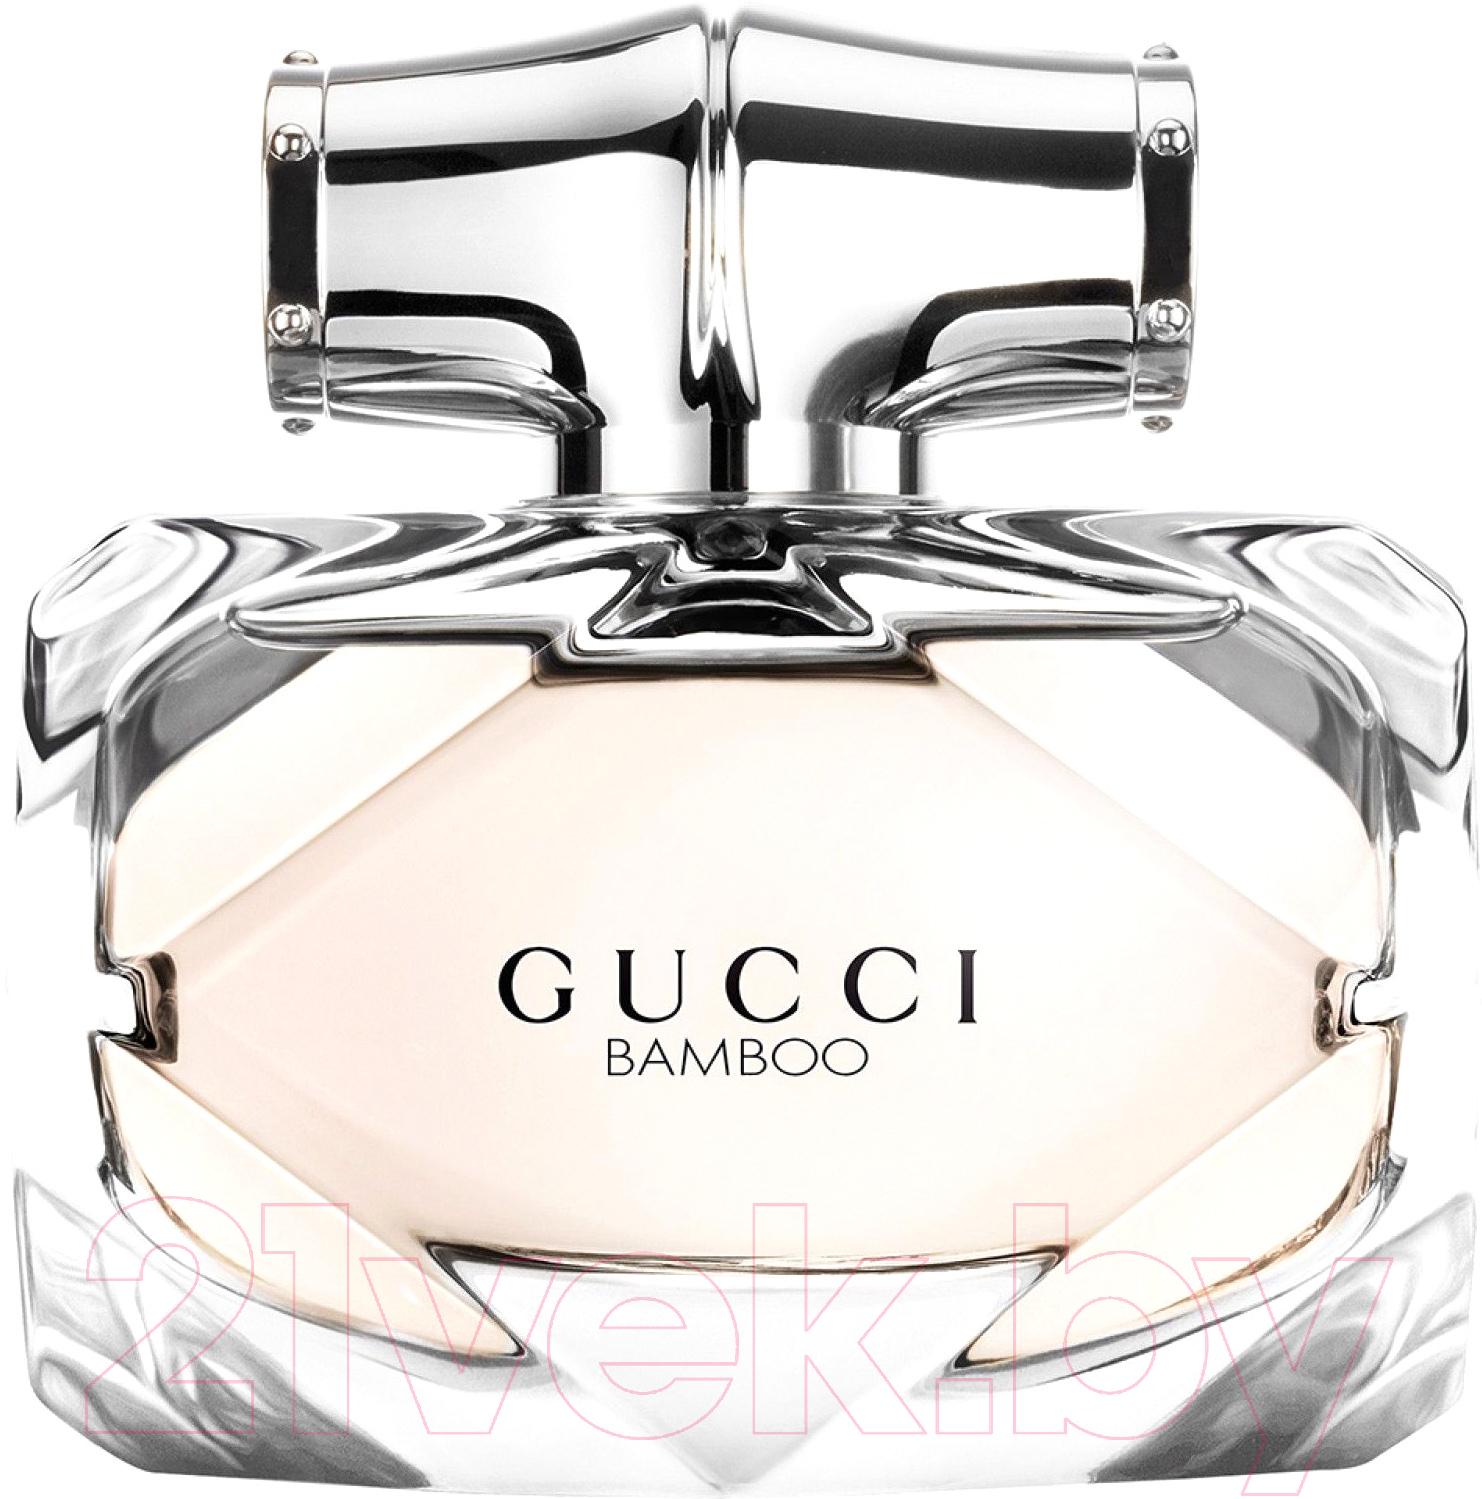 Купить Туалетная вода Gucci, Bamboo (75мл), Швейцария, Bamboo (Gucci)